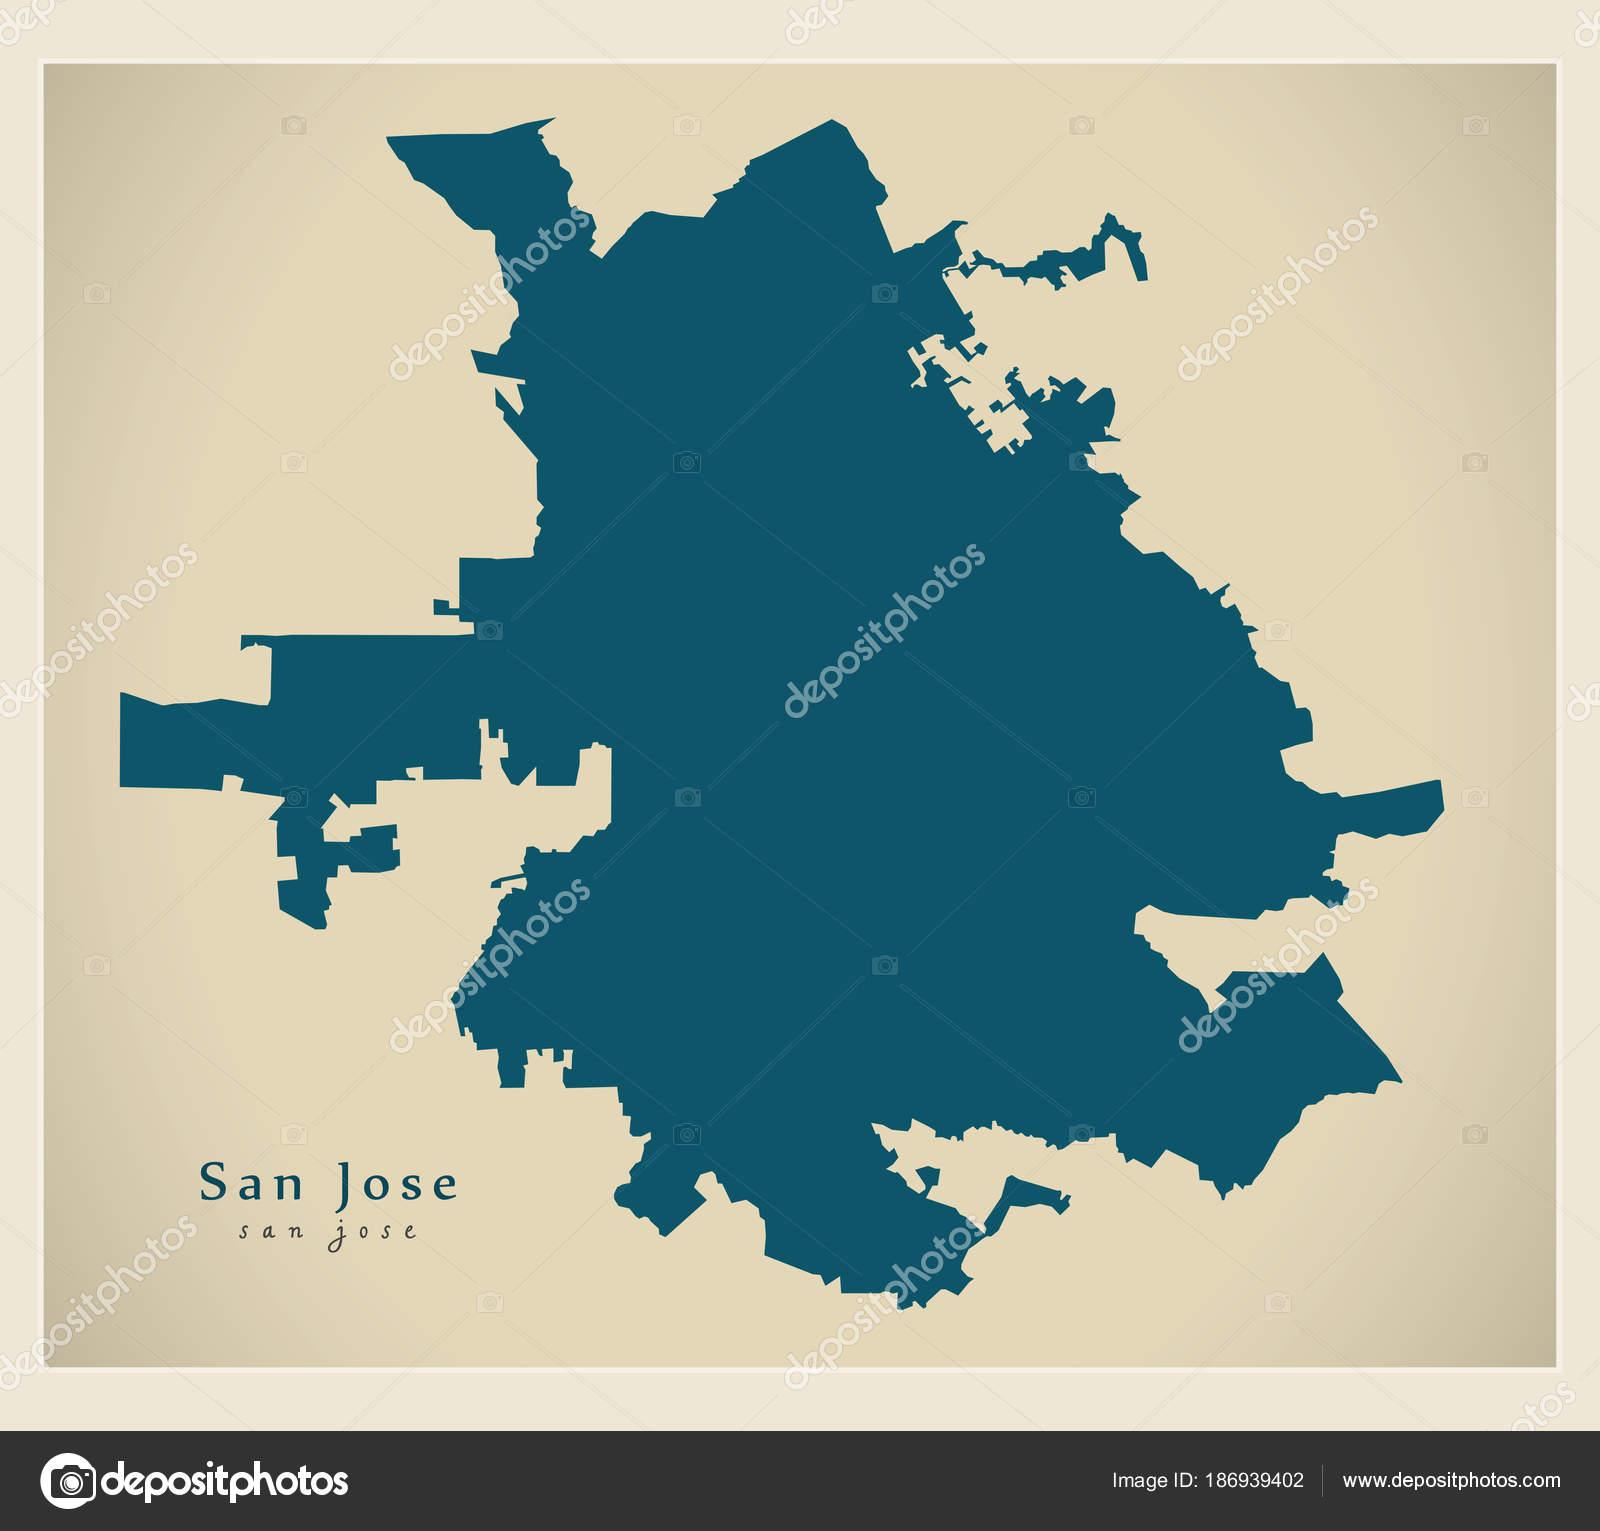 Modern Map - San Jose California USA city map — Stock Vector ... on phoenix scottsdale area map, d.c. metro area map, antioch area map, oxnard area map, bay area map, rogersville shale area map, san antonio, tillamook area map, el paso, winchester mystery house, los angeles, haifa area map, gulfport biloxi area map, longview tx area map, santa cruz, sebring fl area map, glendale area map, san francisco bay area, san diego, san francisco, santa barbara, city of san francisco area map, long beach, elk grove area map, sacramento area map, silicon valley, santa cruz map, sf area map, district of columbia area map, santa clara, palo alto, concord area map, cabo san lucas area map,